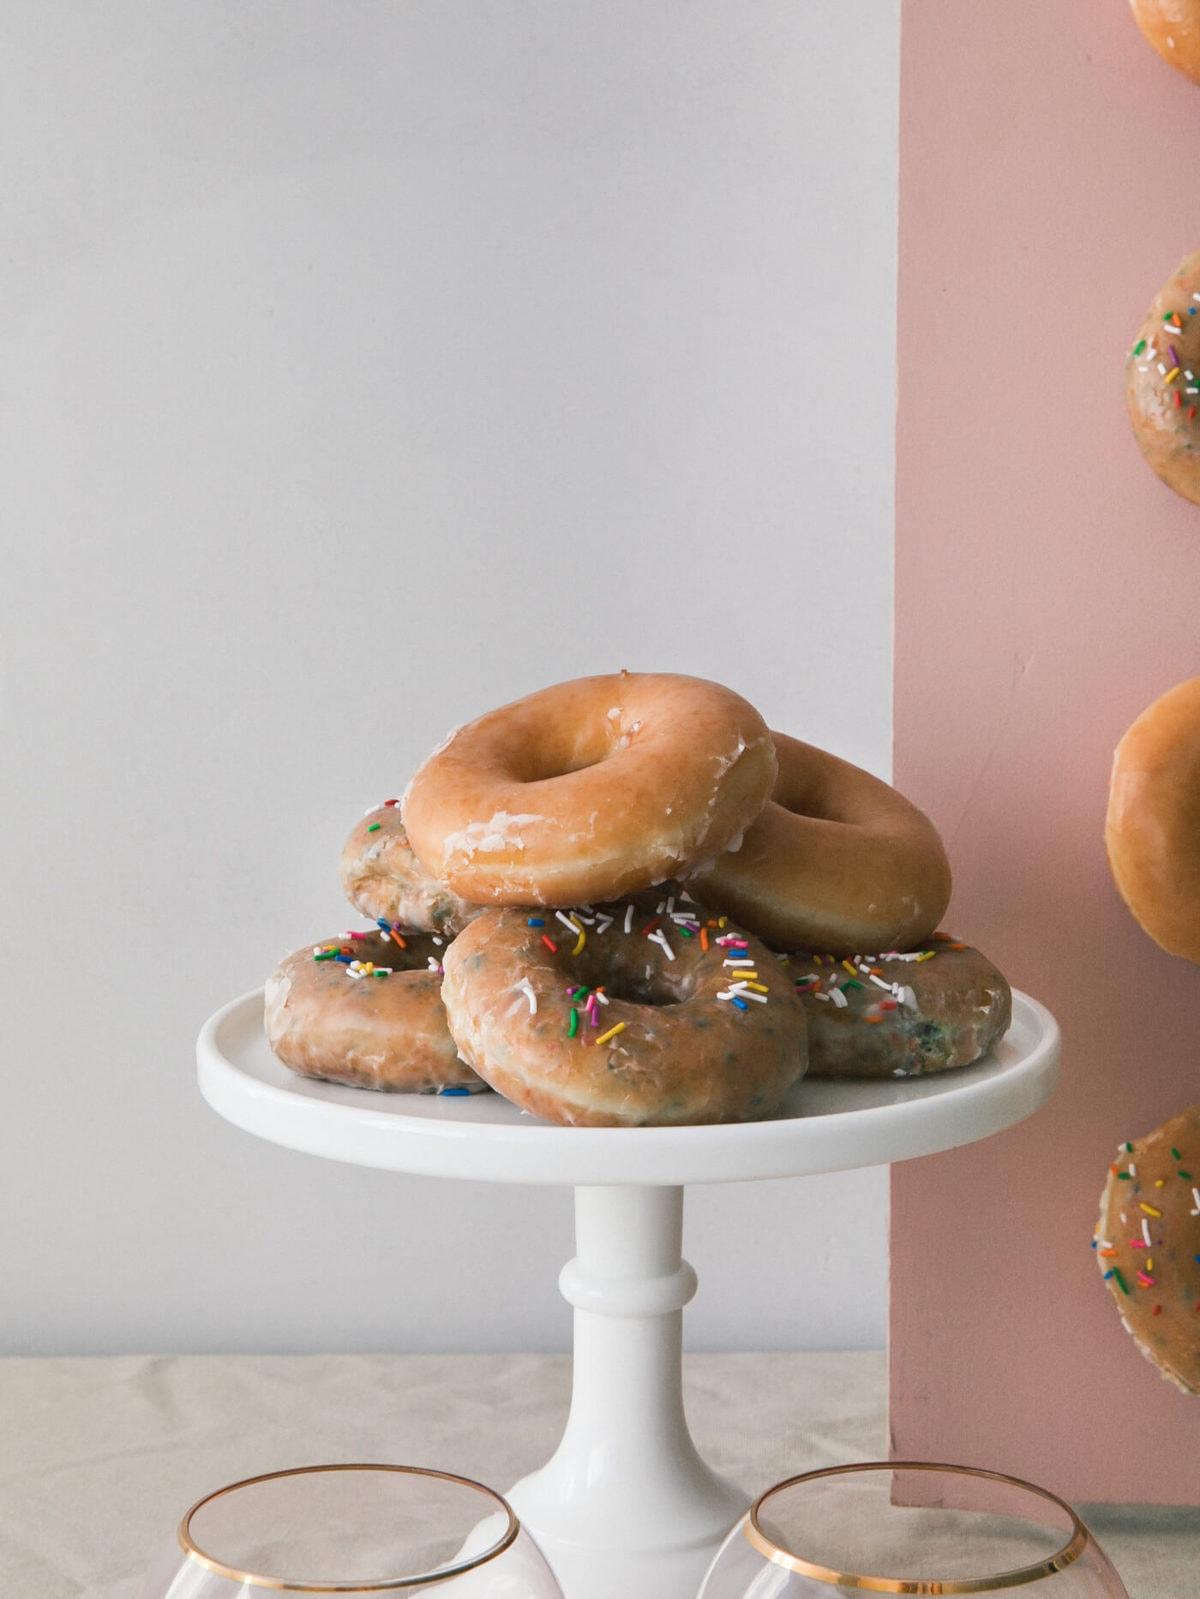 How to Make a Doughnut Wall